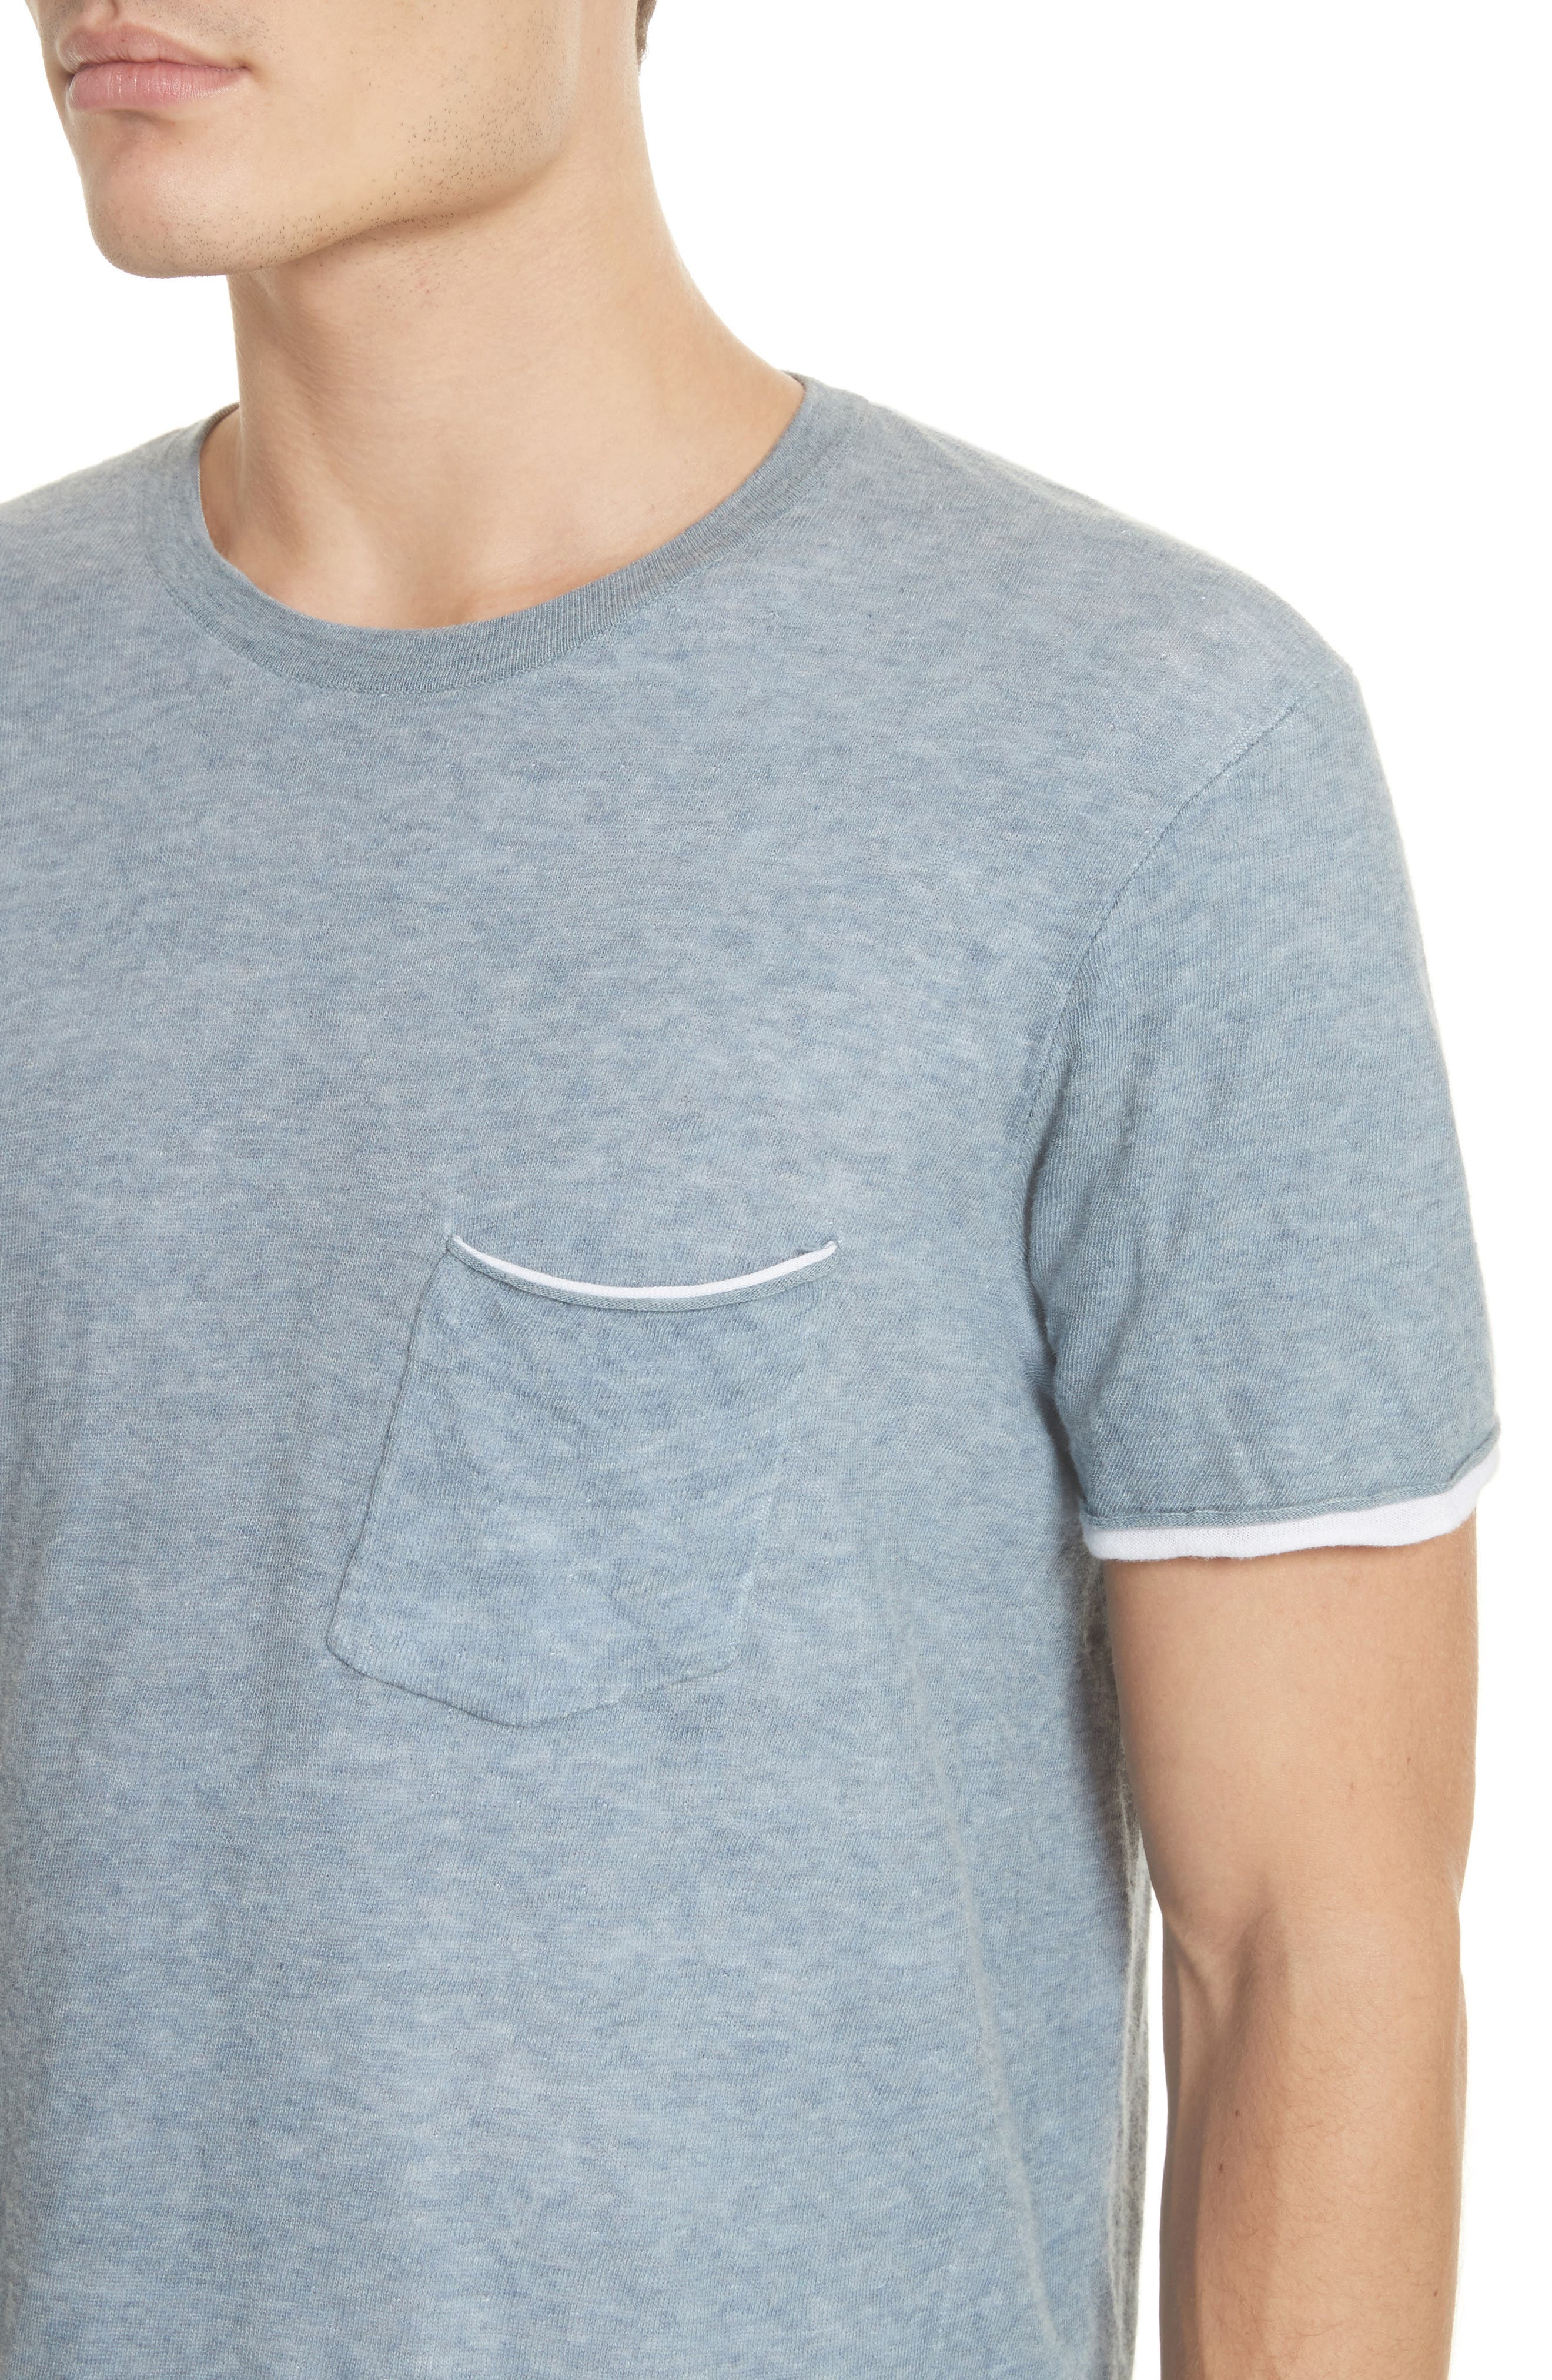 Tripp Pocket T-Shirt,                             Alternate thumbnail 4, color,                             Light Blue